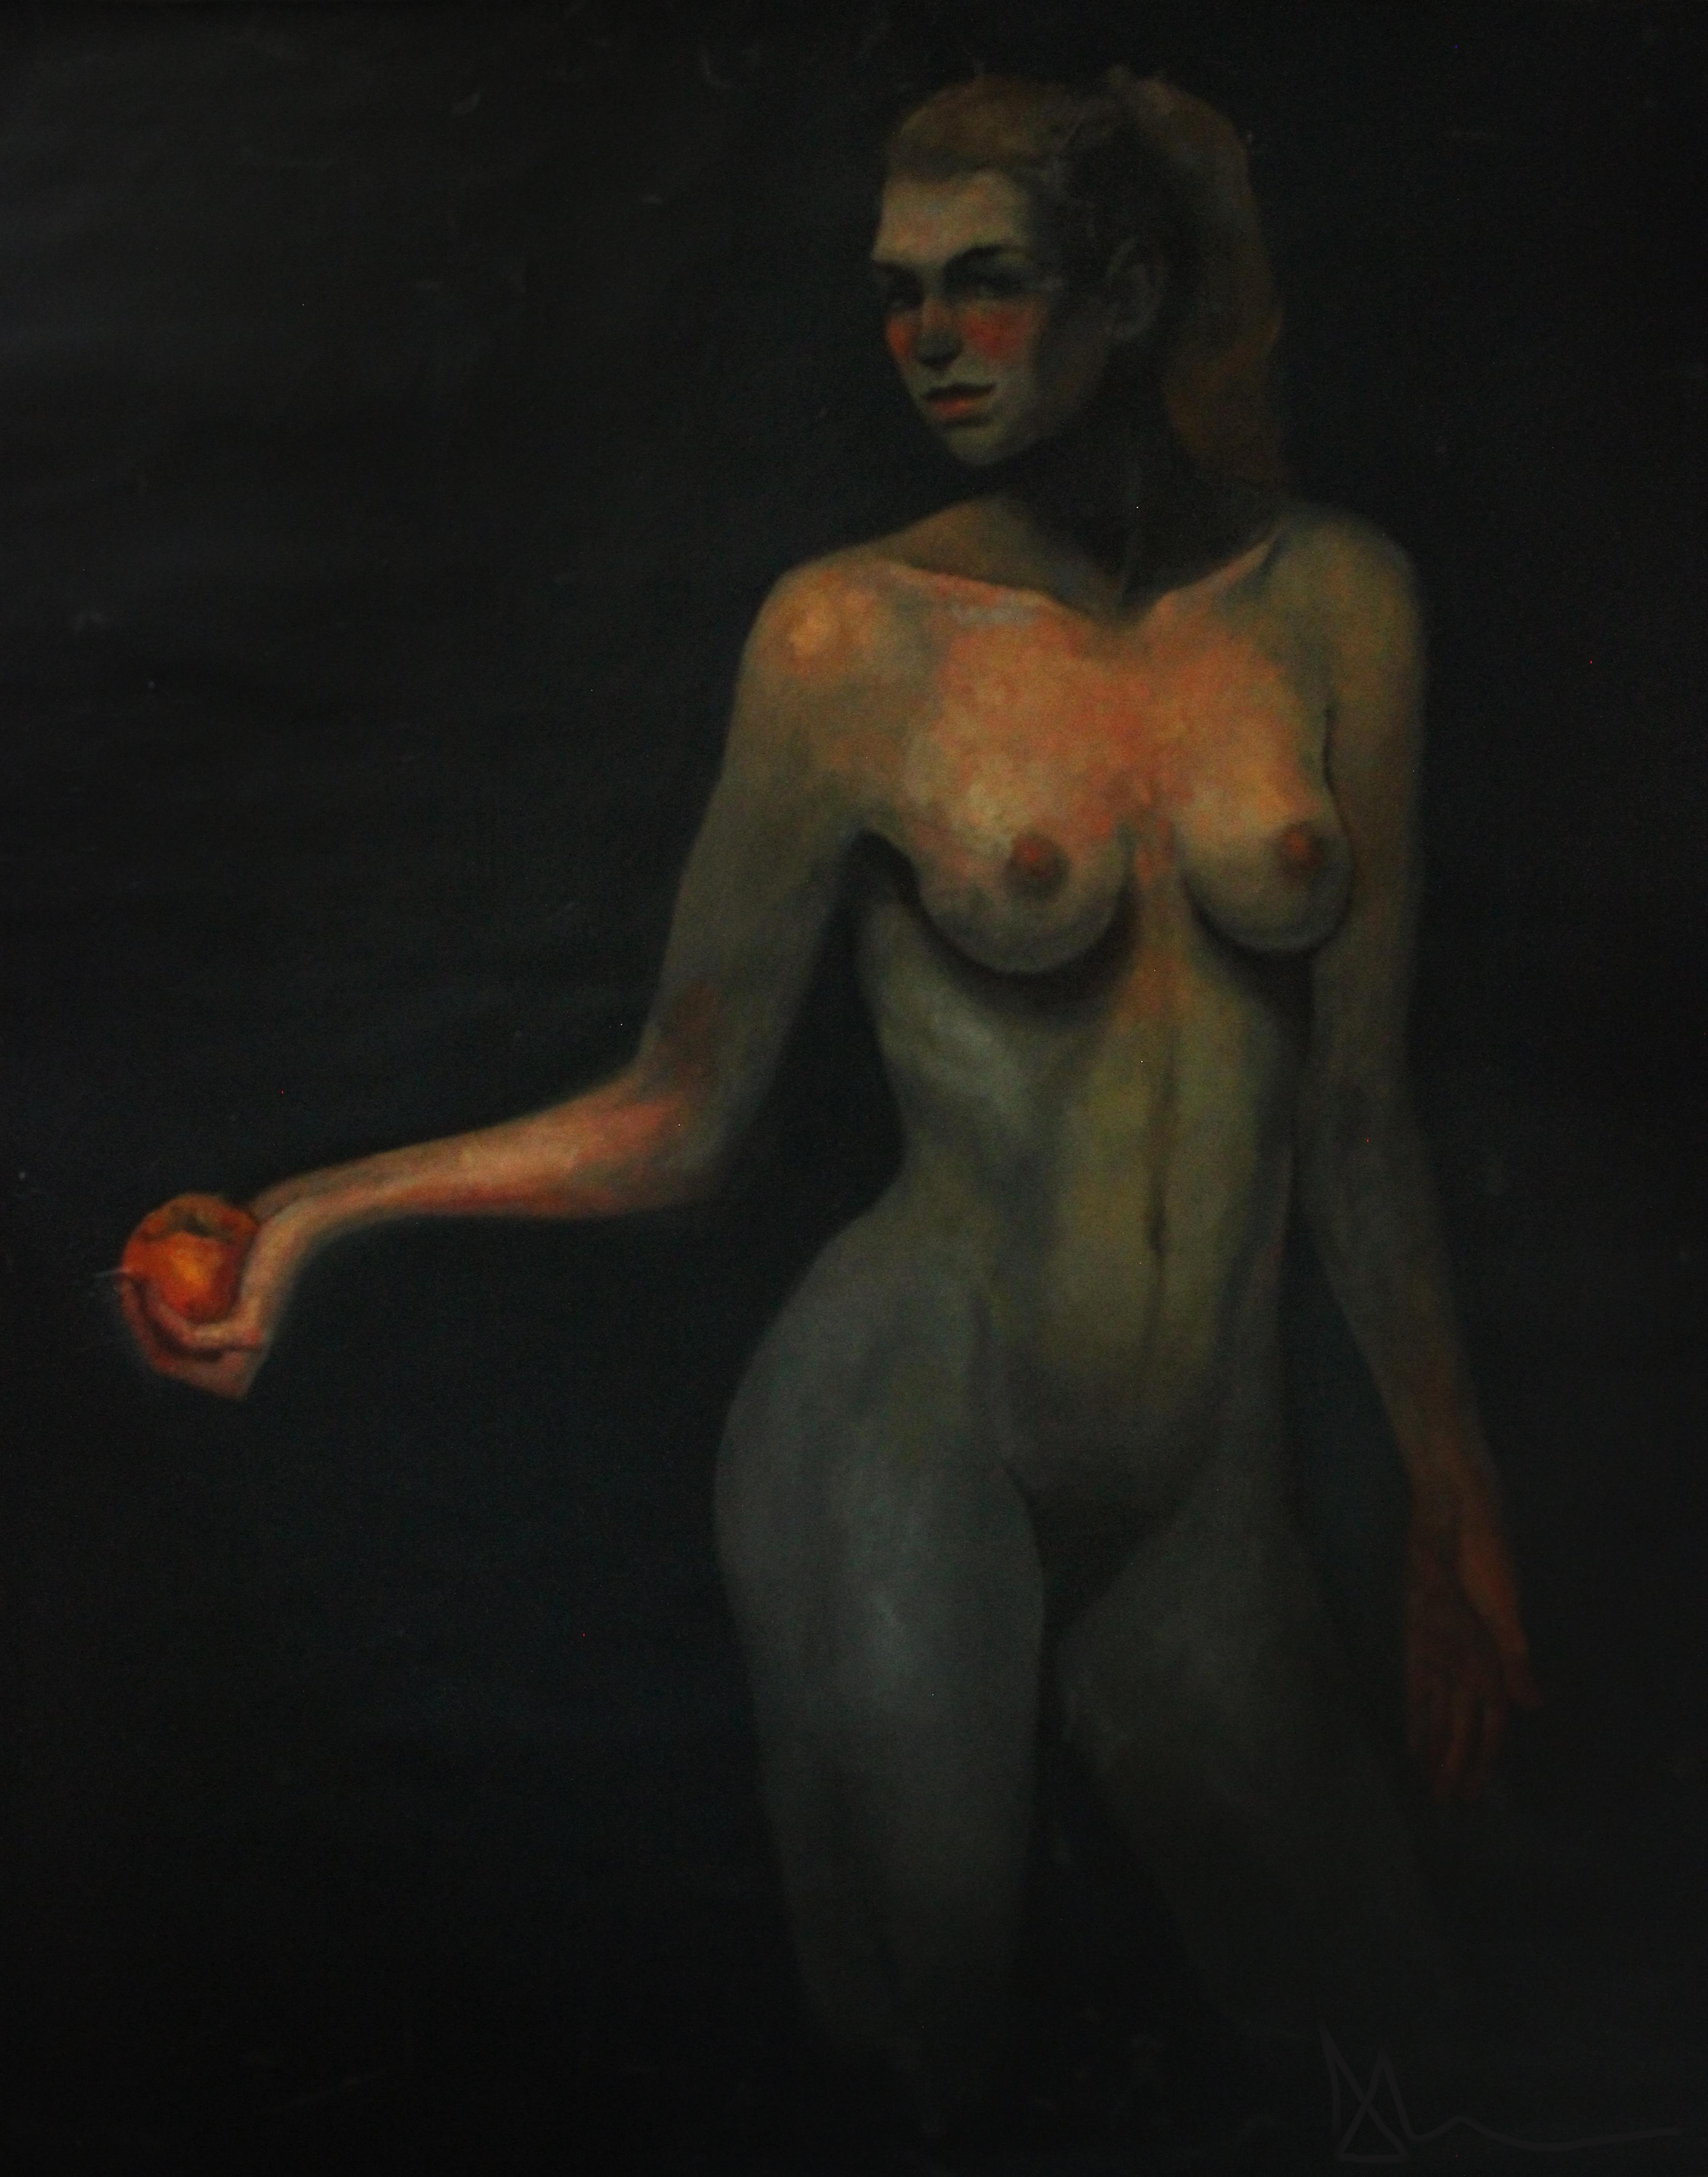 Daria Avdeeva